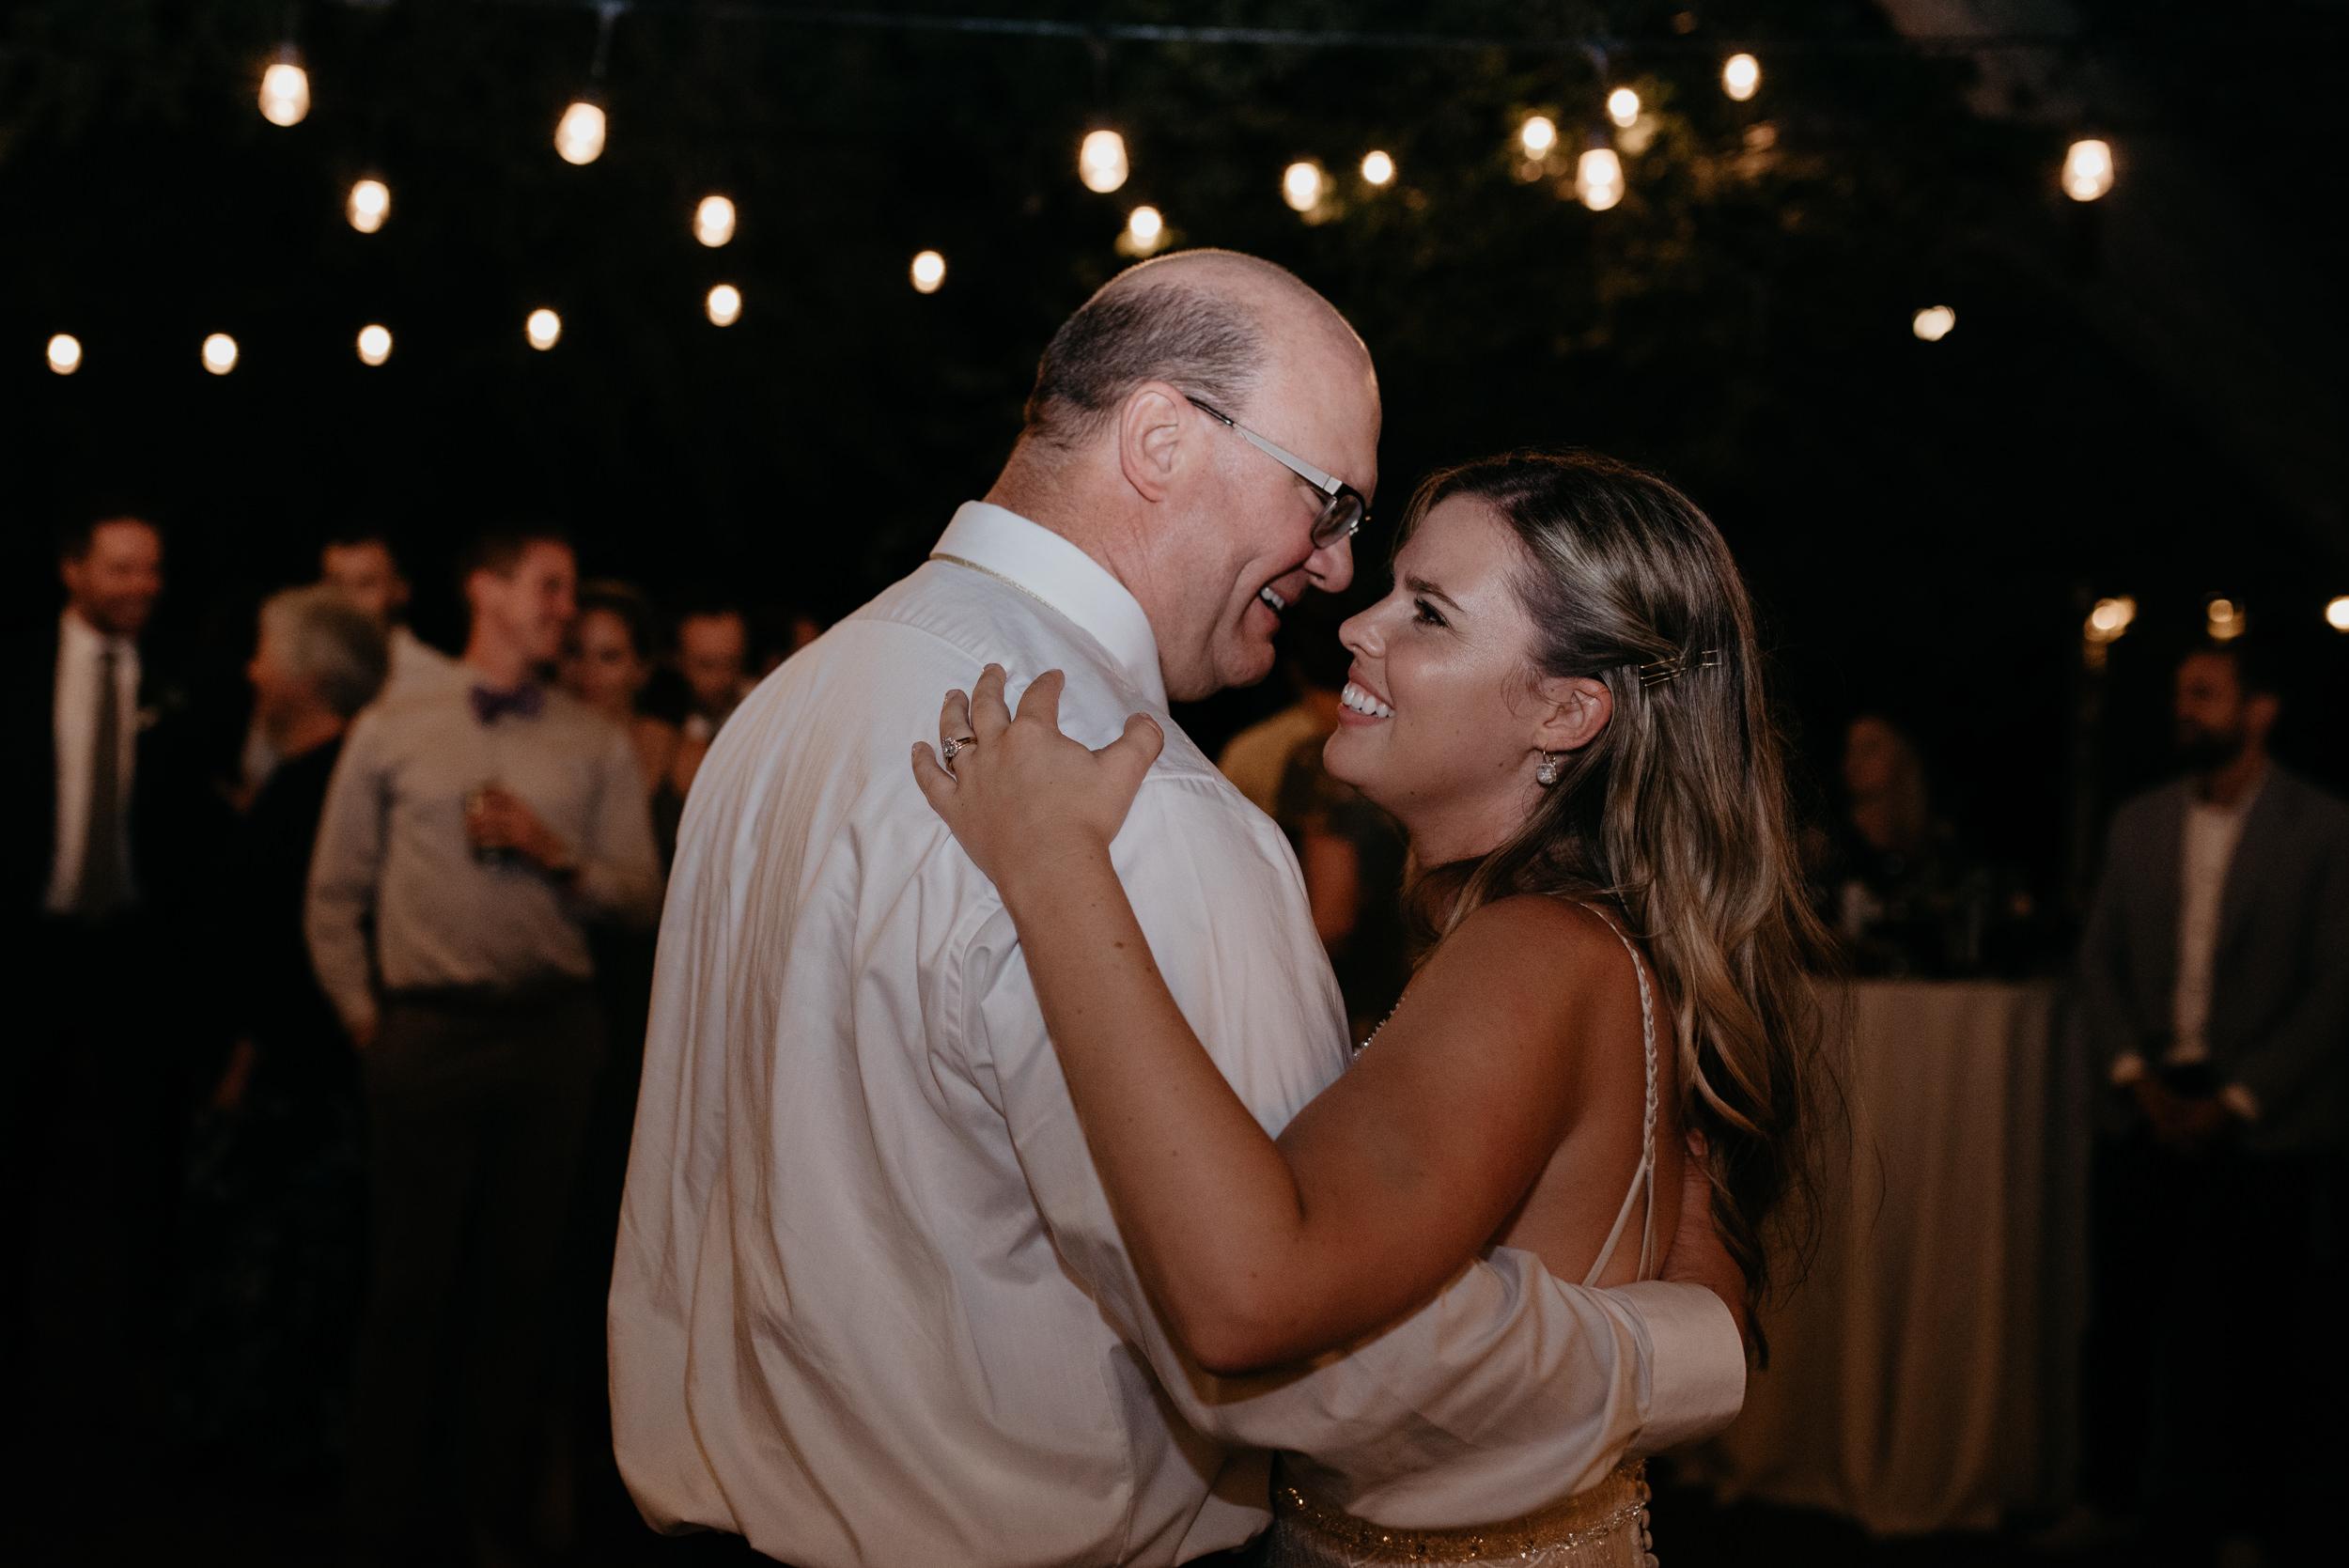 Breckenridge, Colorado elopement and wedding photographer.